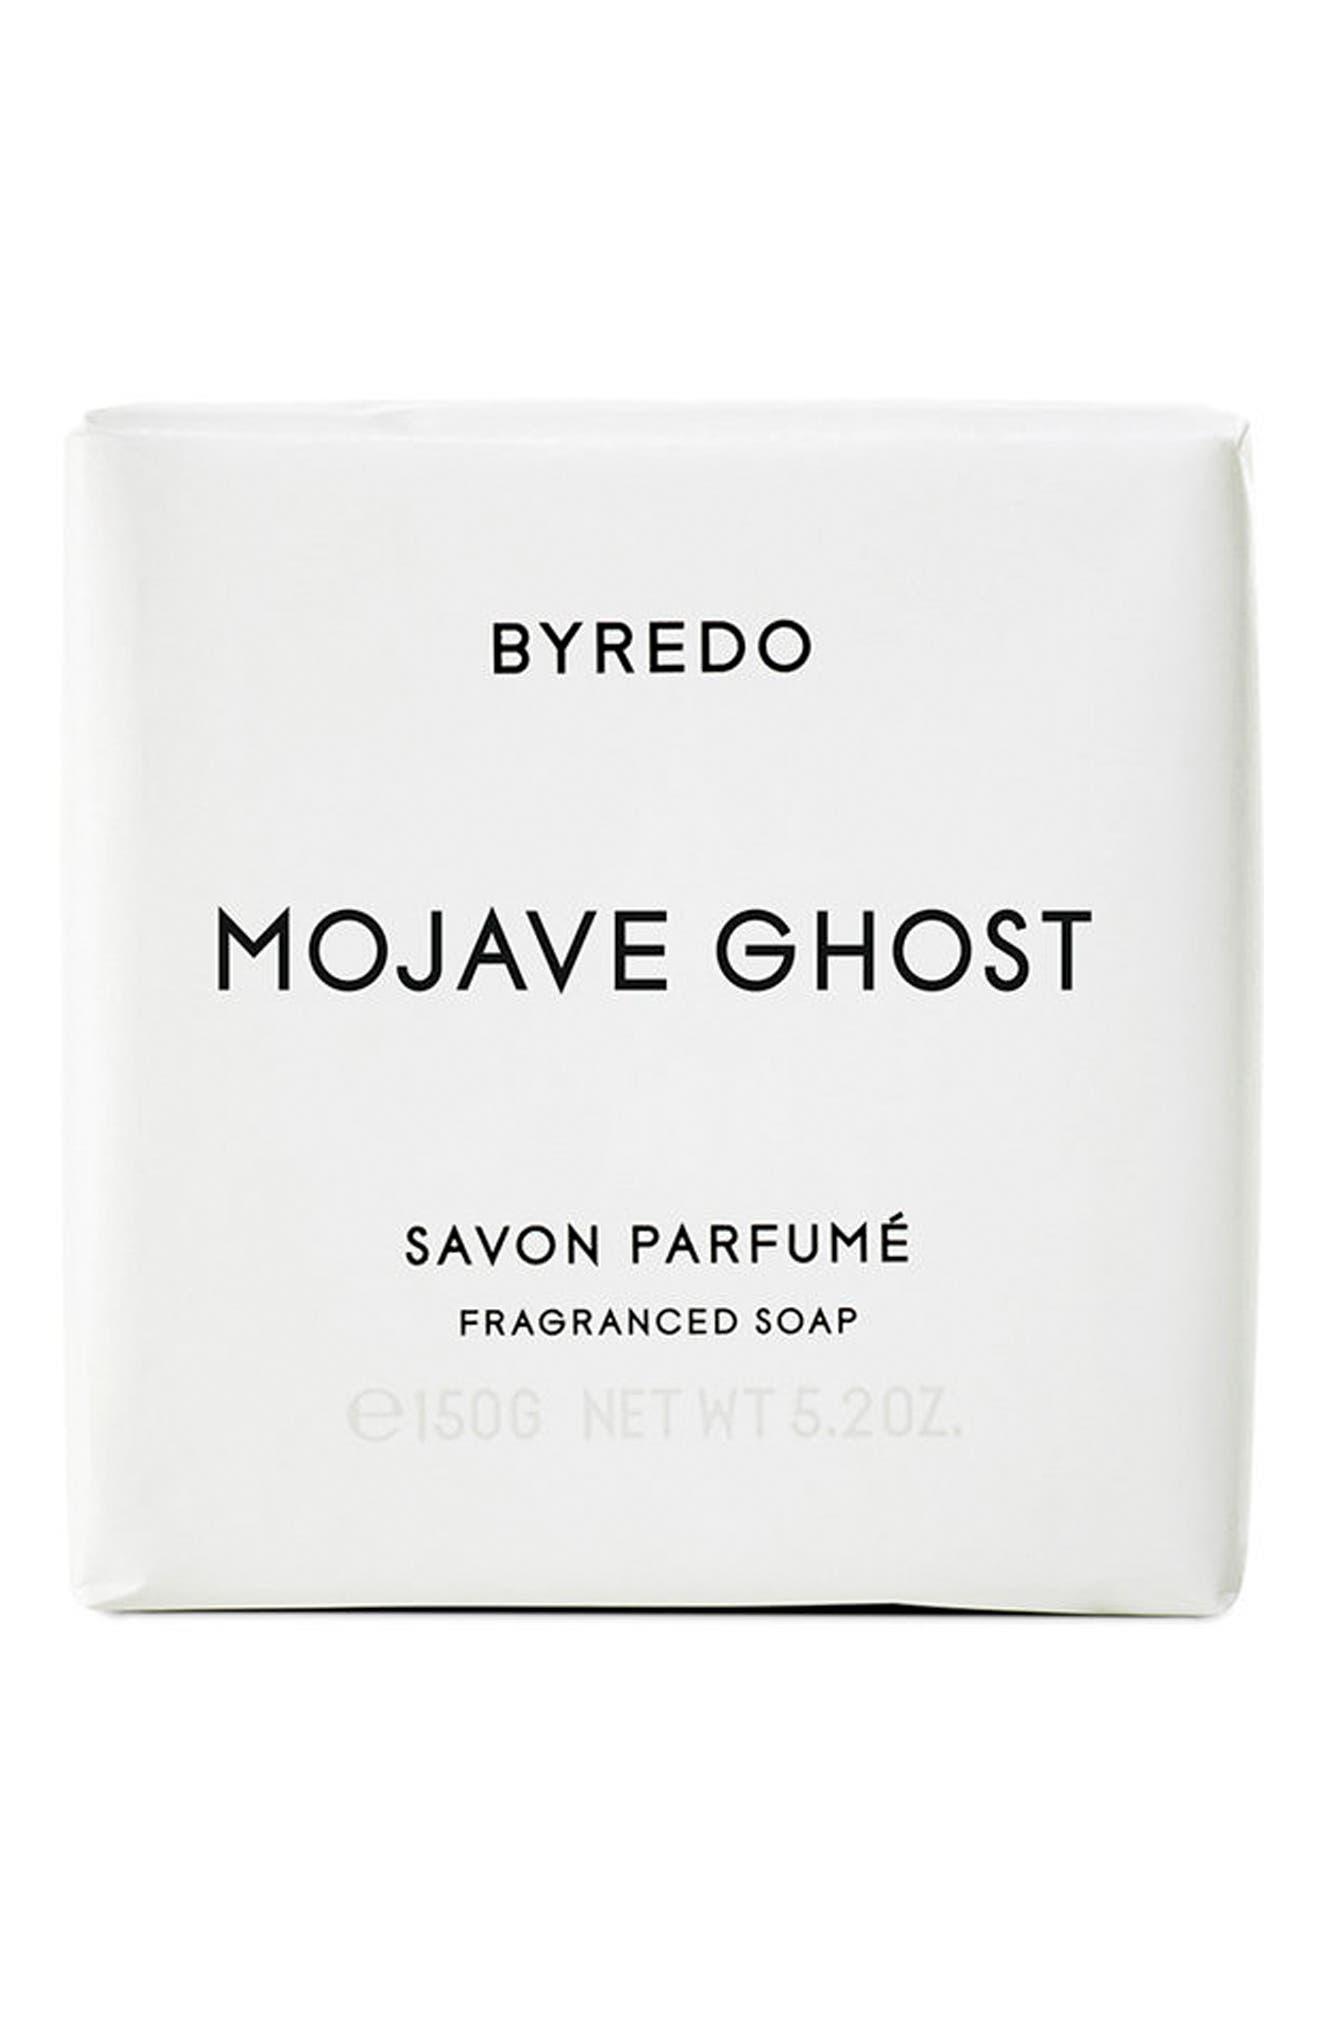 Mojave Ghost Soap Bar,                         Main,                         color, NO COLOR